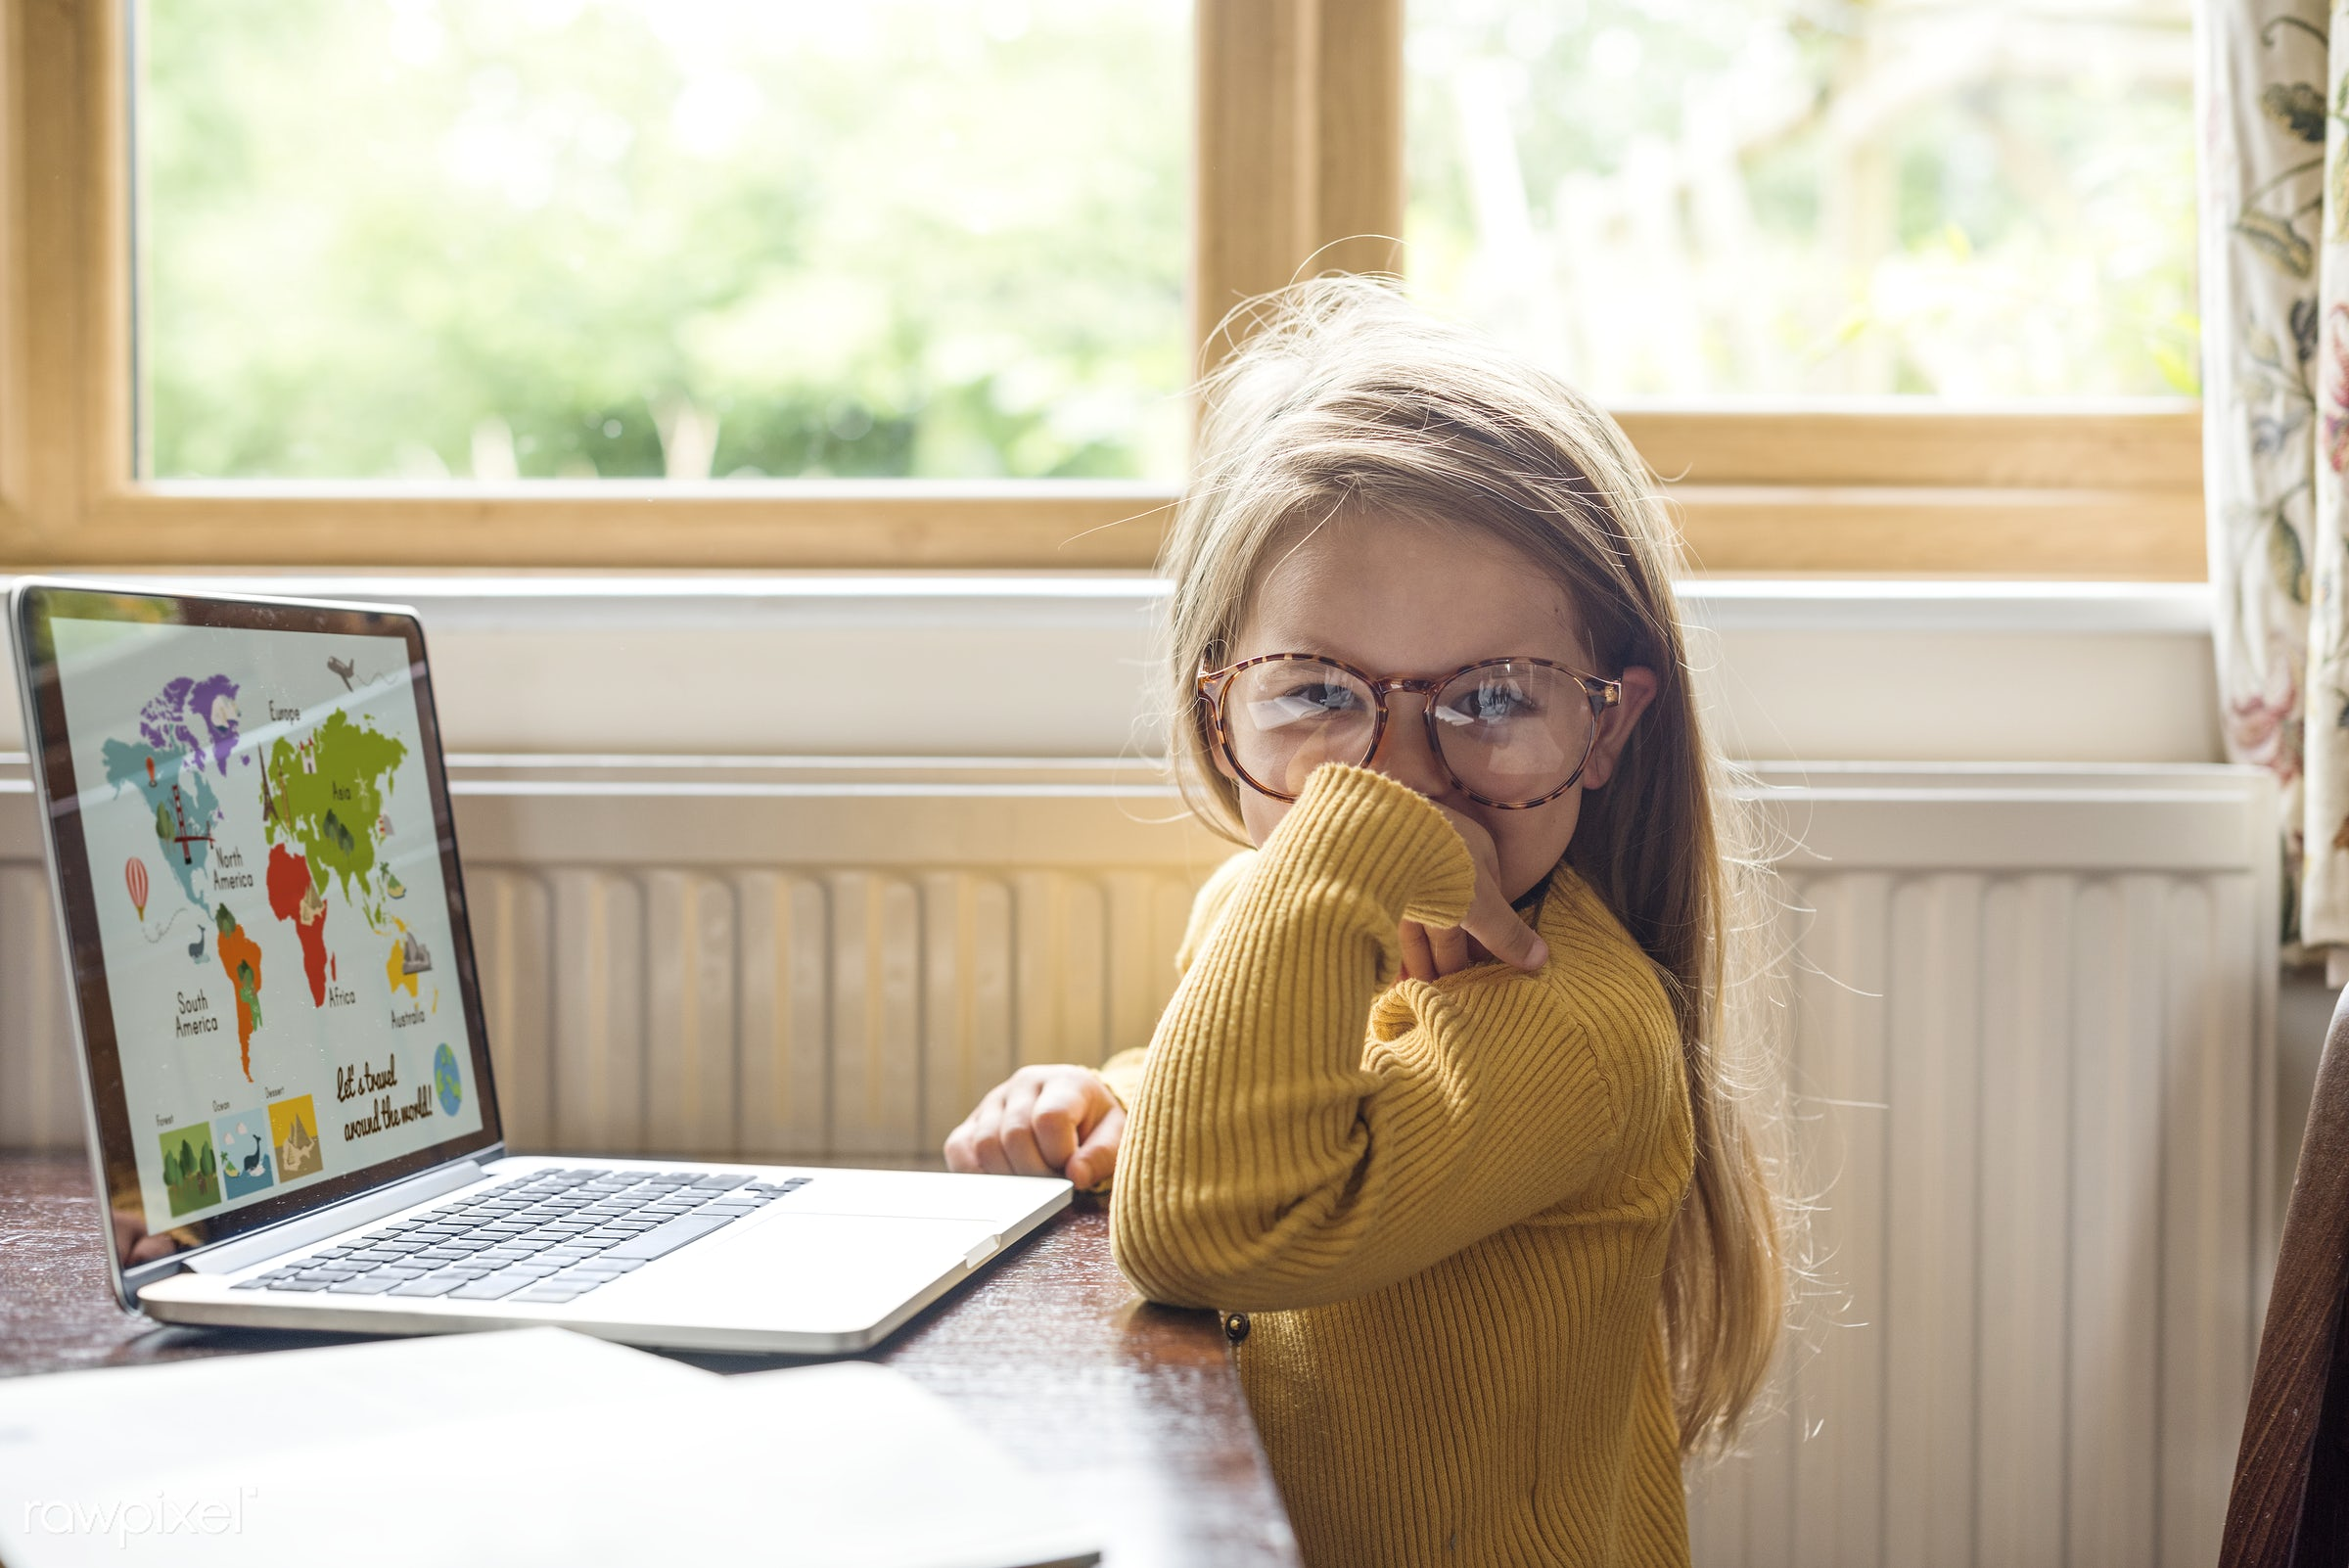 technology, book, gaming, activity, bookshelf, browsing, cape, casual, cheerful, child, children, communication, computer,...